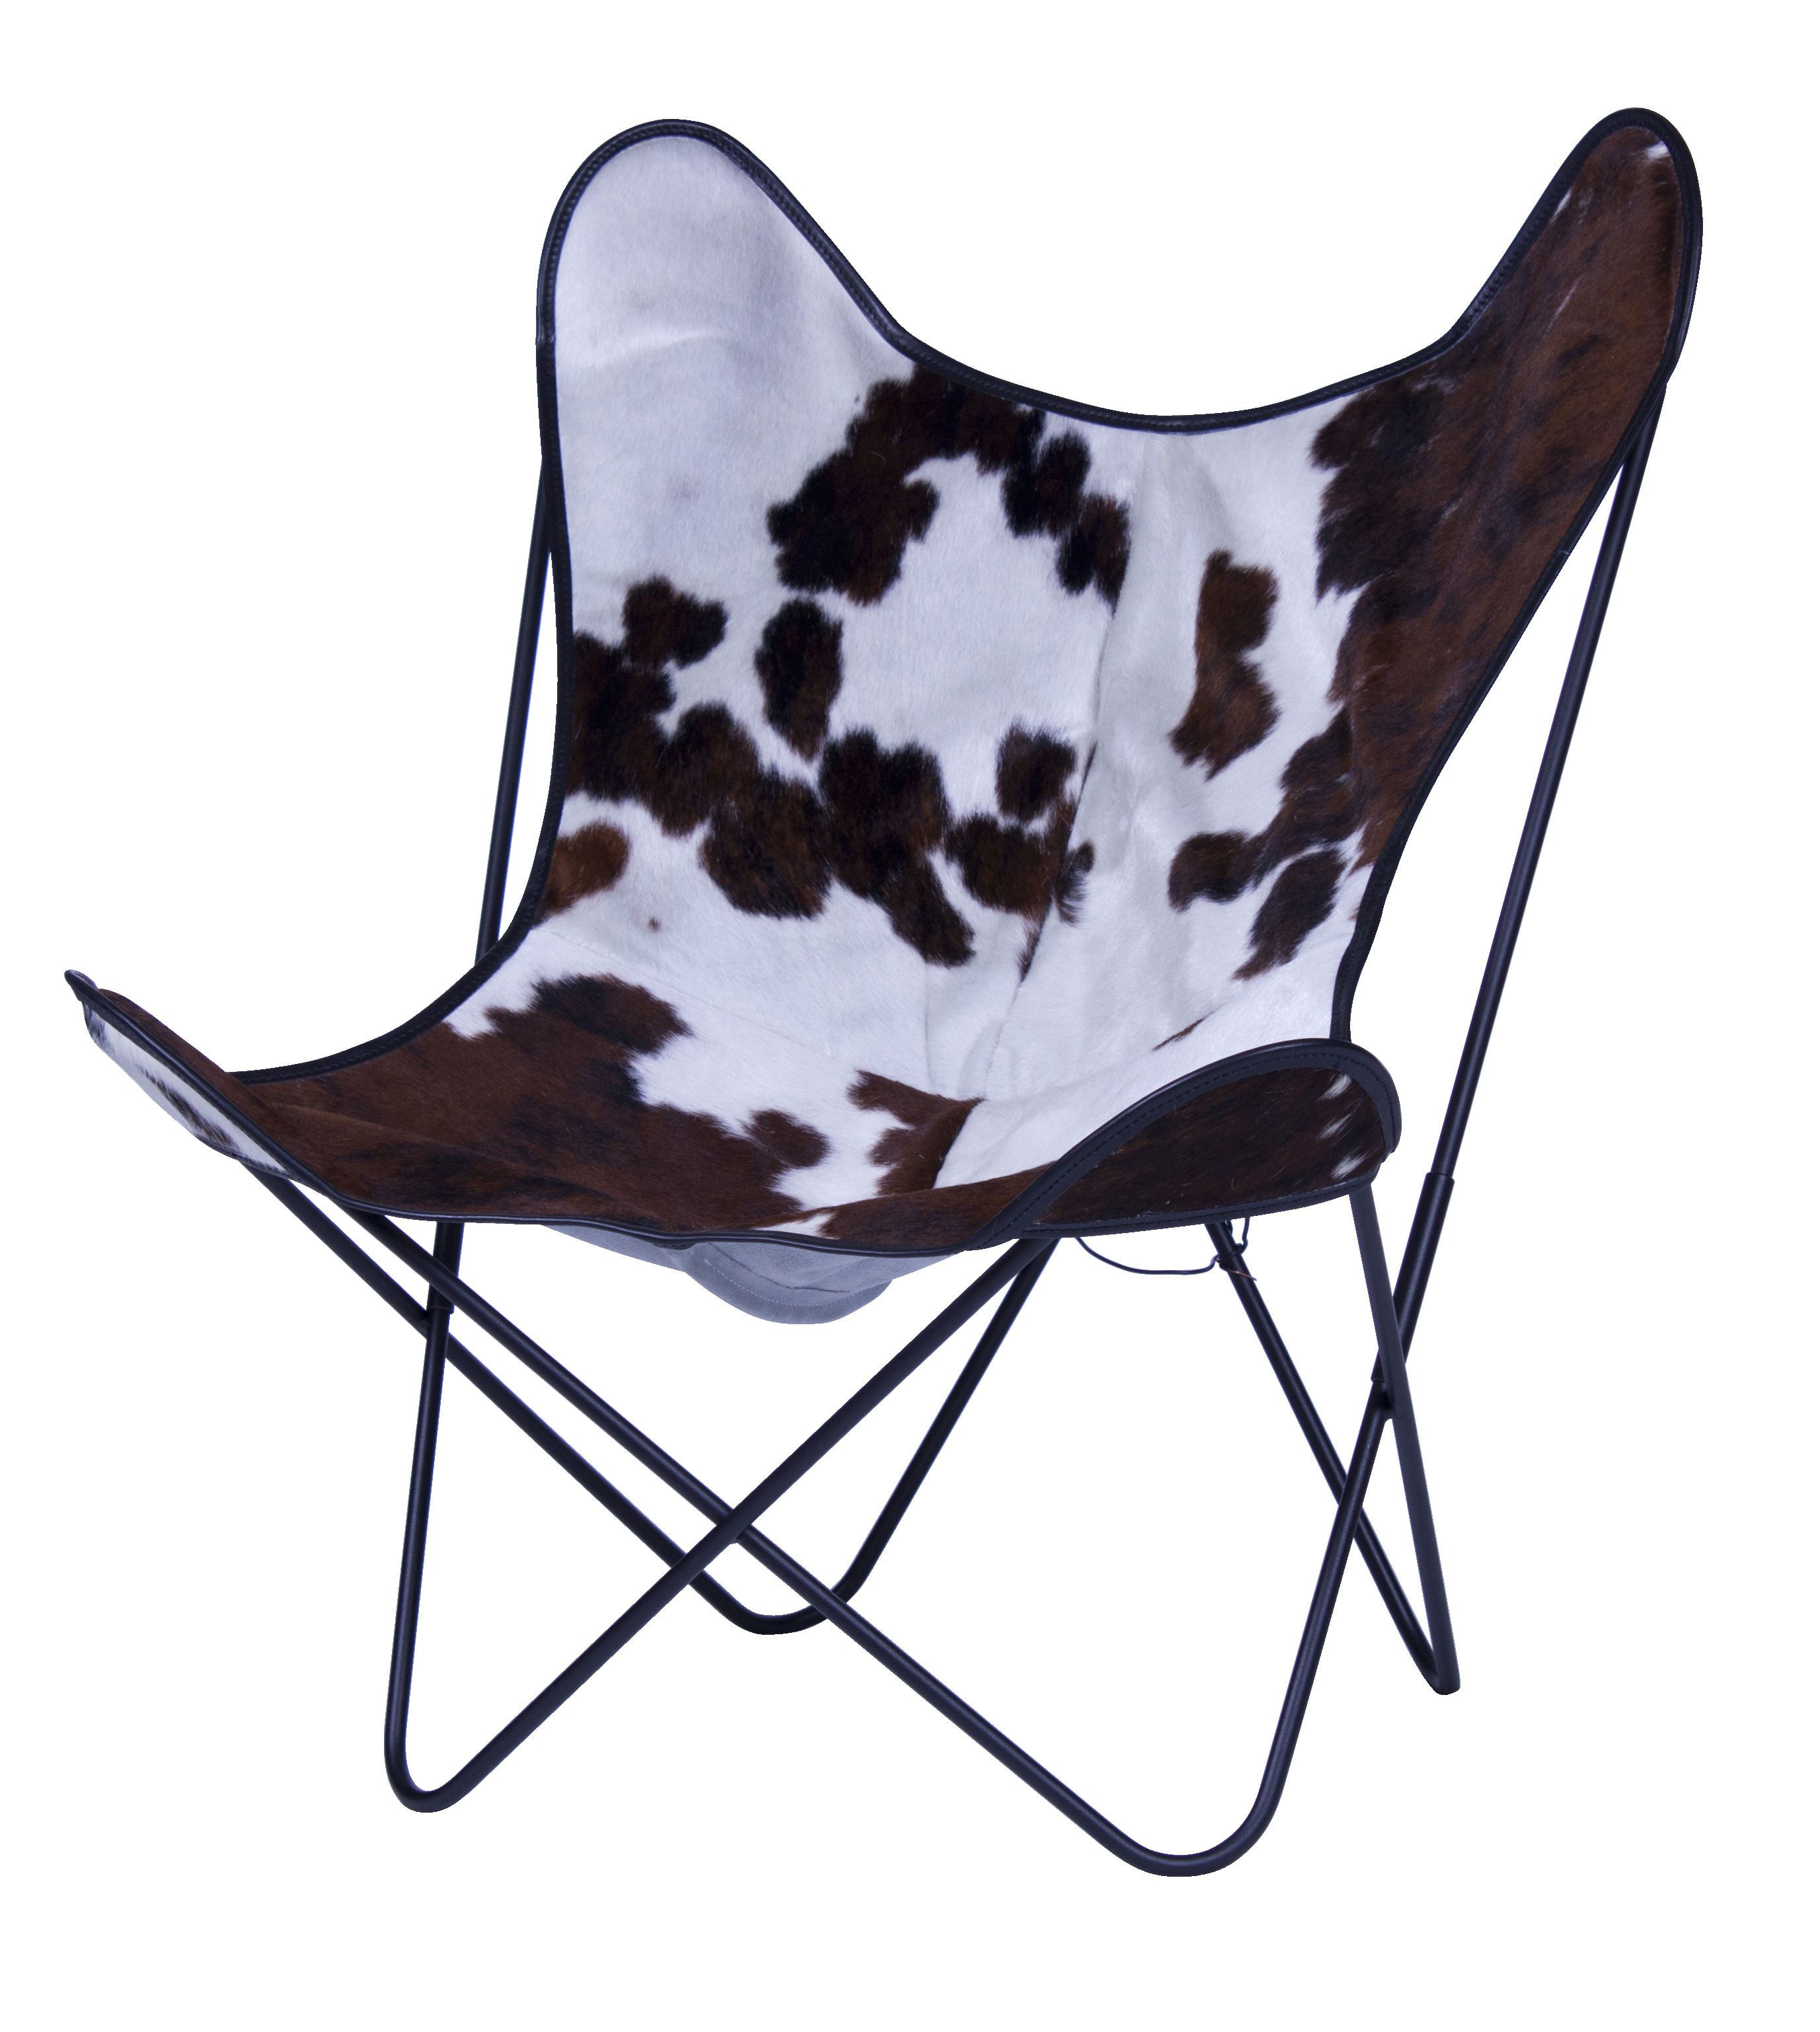 aa butterfly leder gestell schwarz aa new design sessel. Black Bedroom Furniture Sets. Home Design Ideas